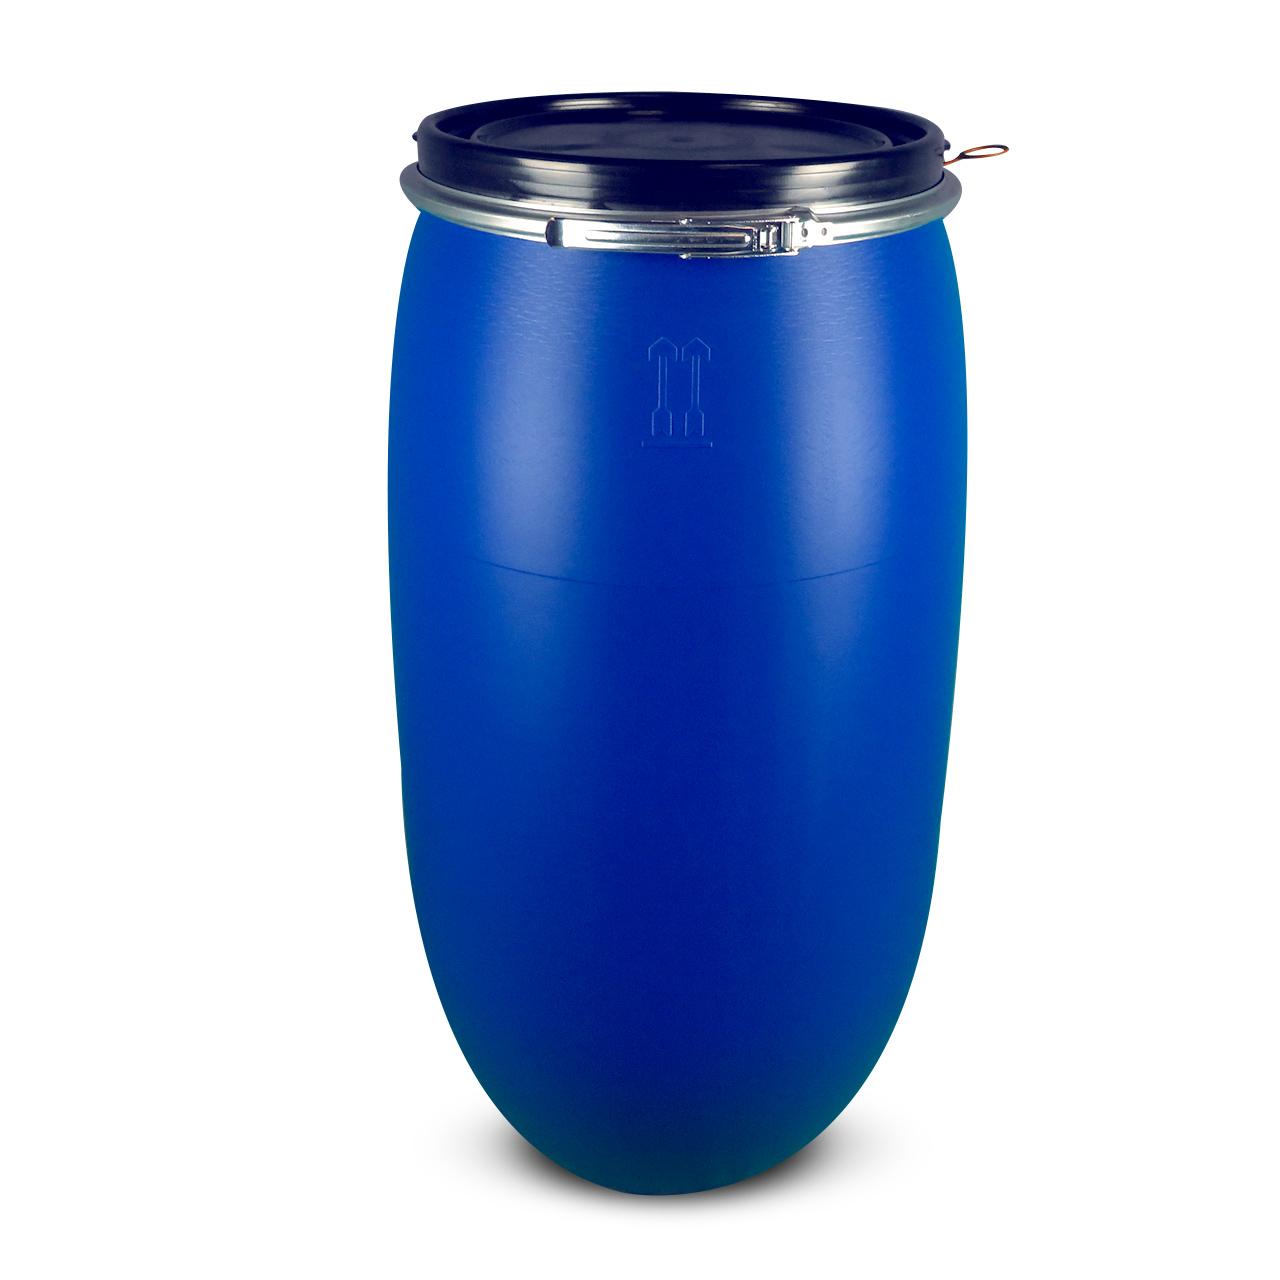 150 L Kunststoffdeckelfass, blau, Entgasung, FDA, UN